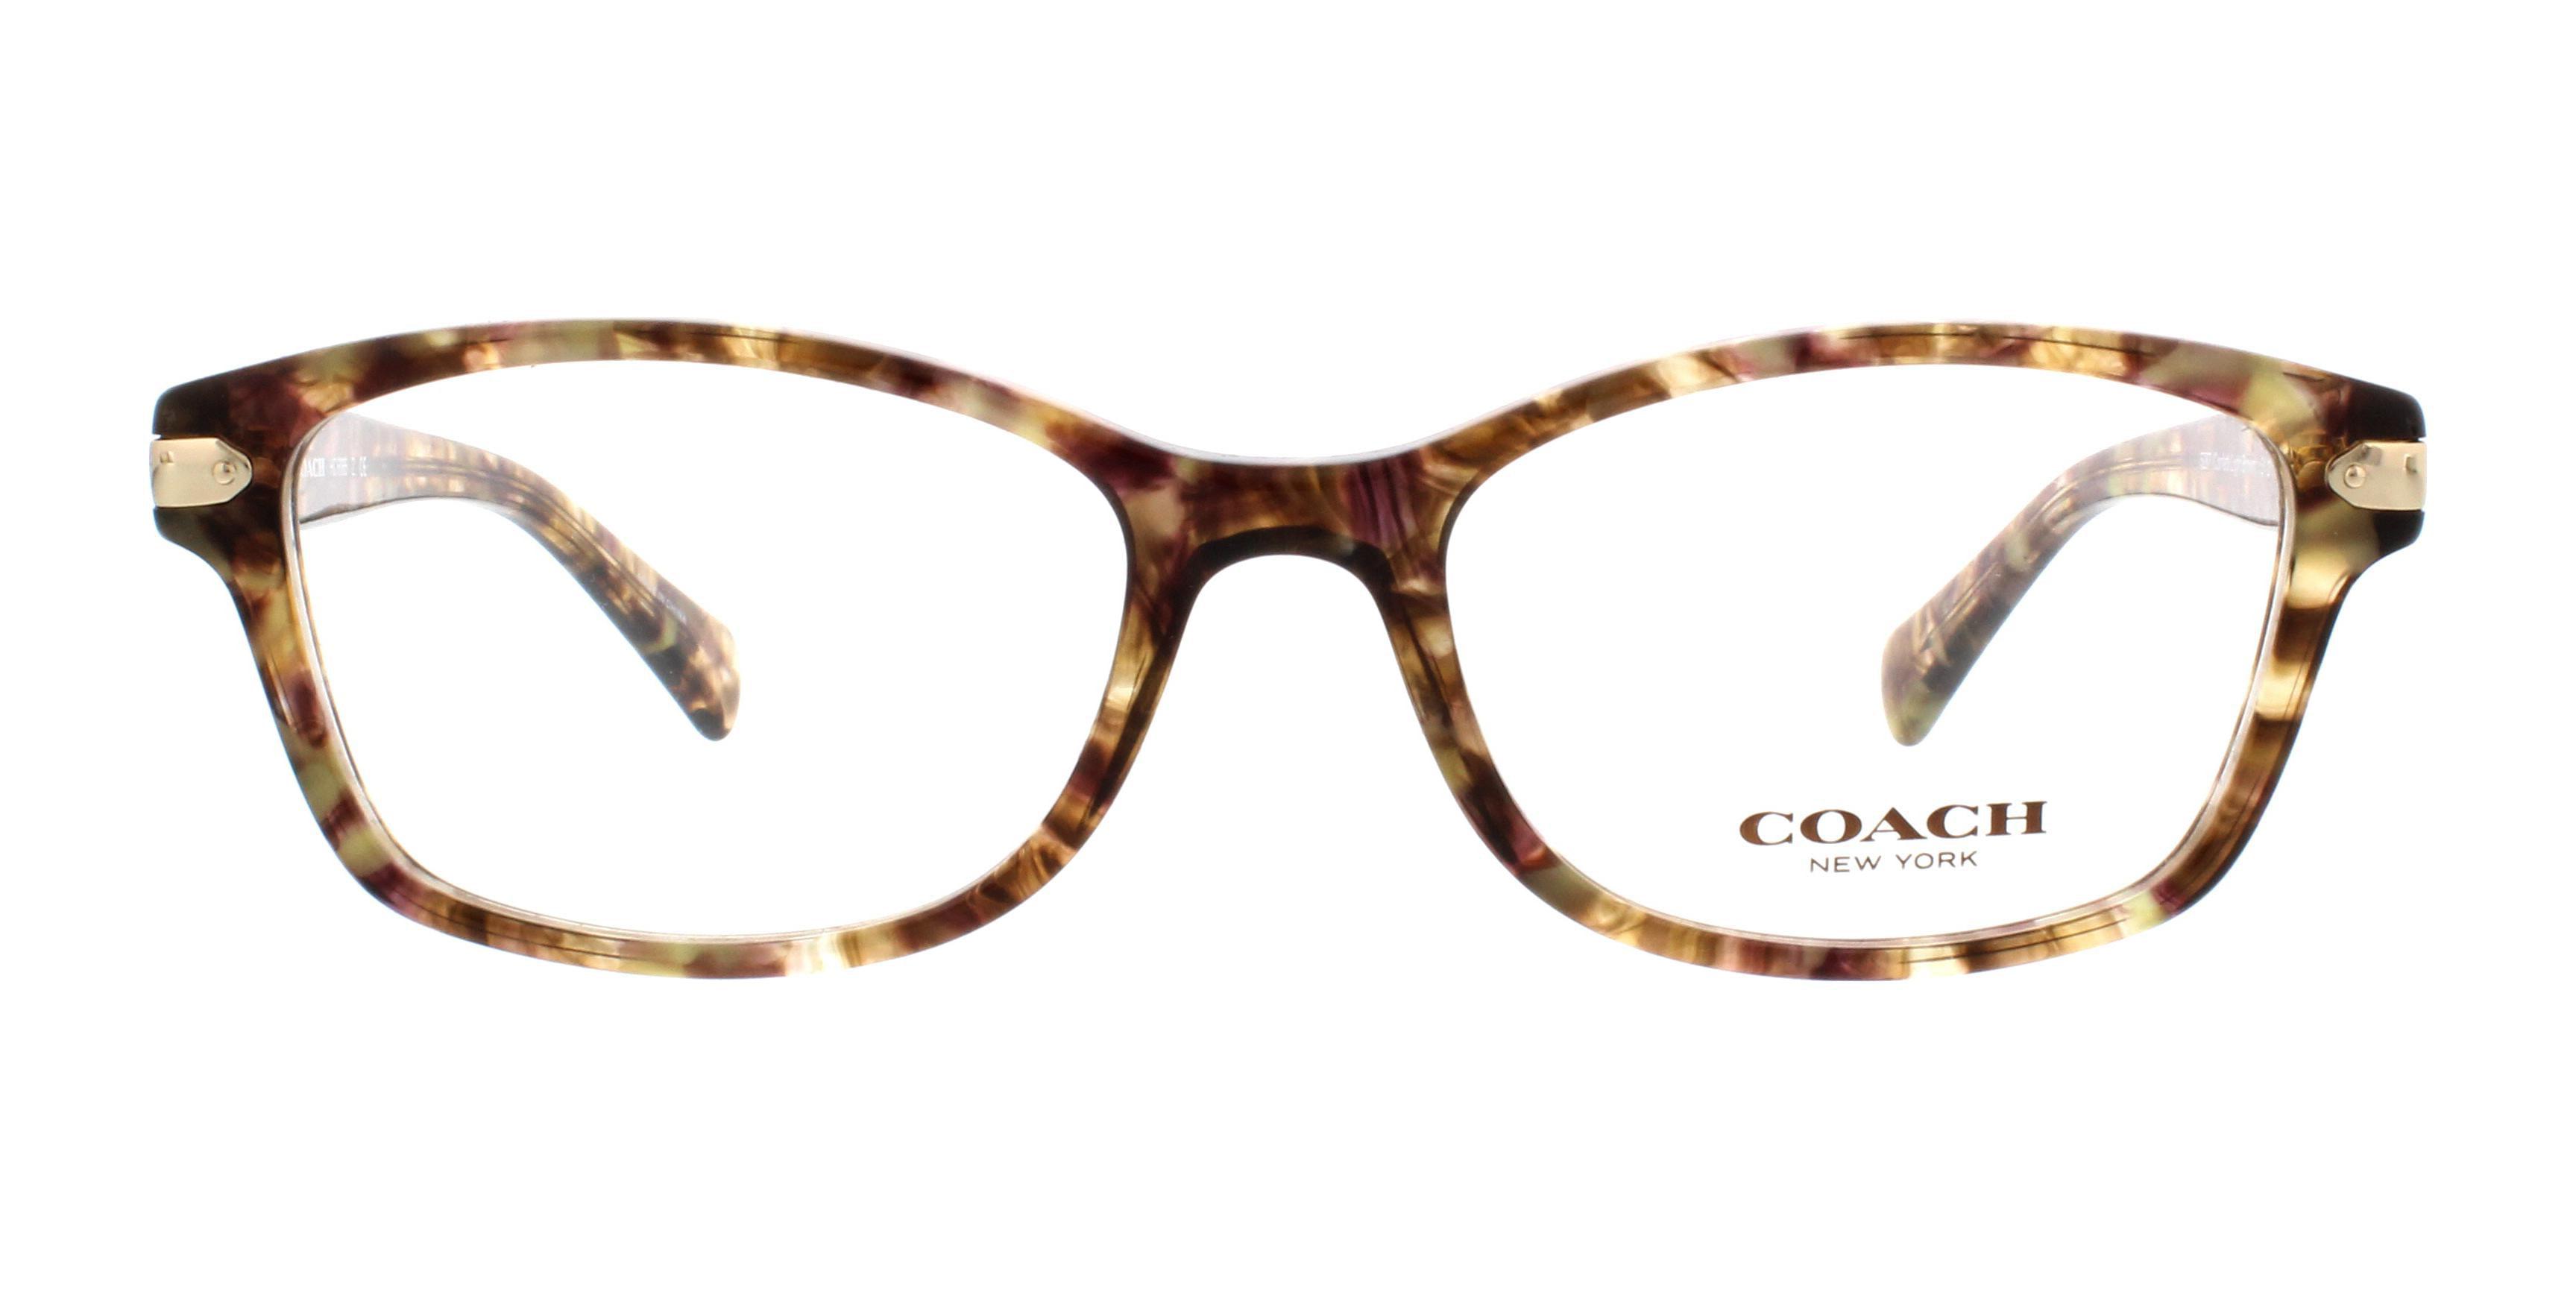 66c58d54a154 COACH Eyeglasses HC6065 5287 Confetti Light Brown 51MM - Walmart.com